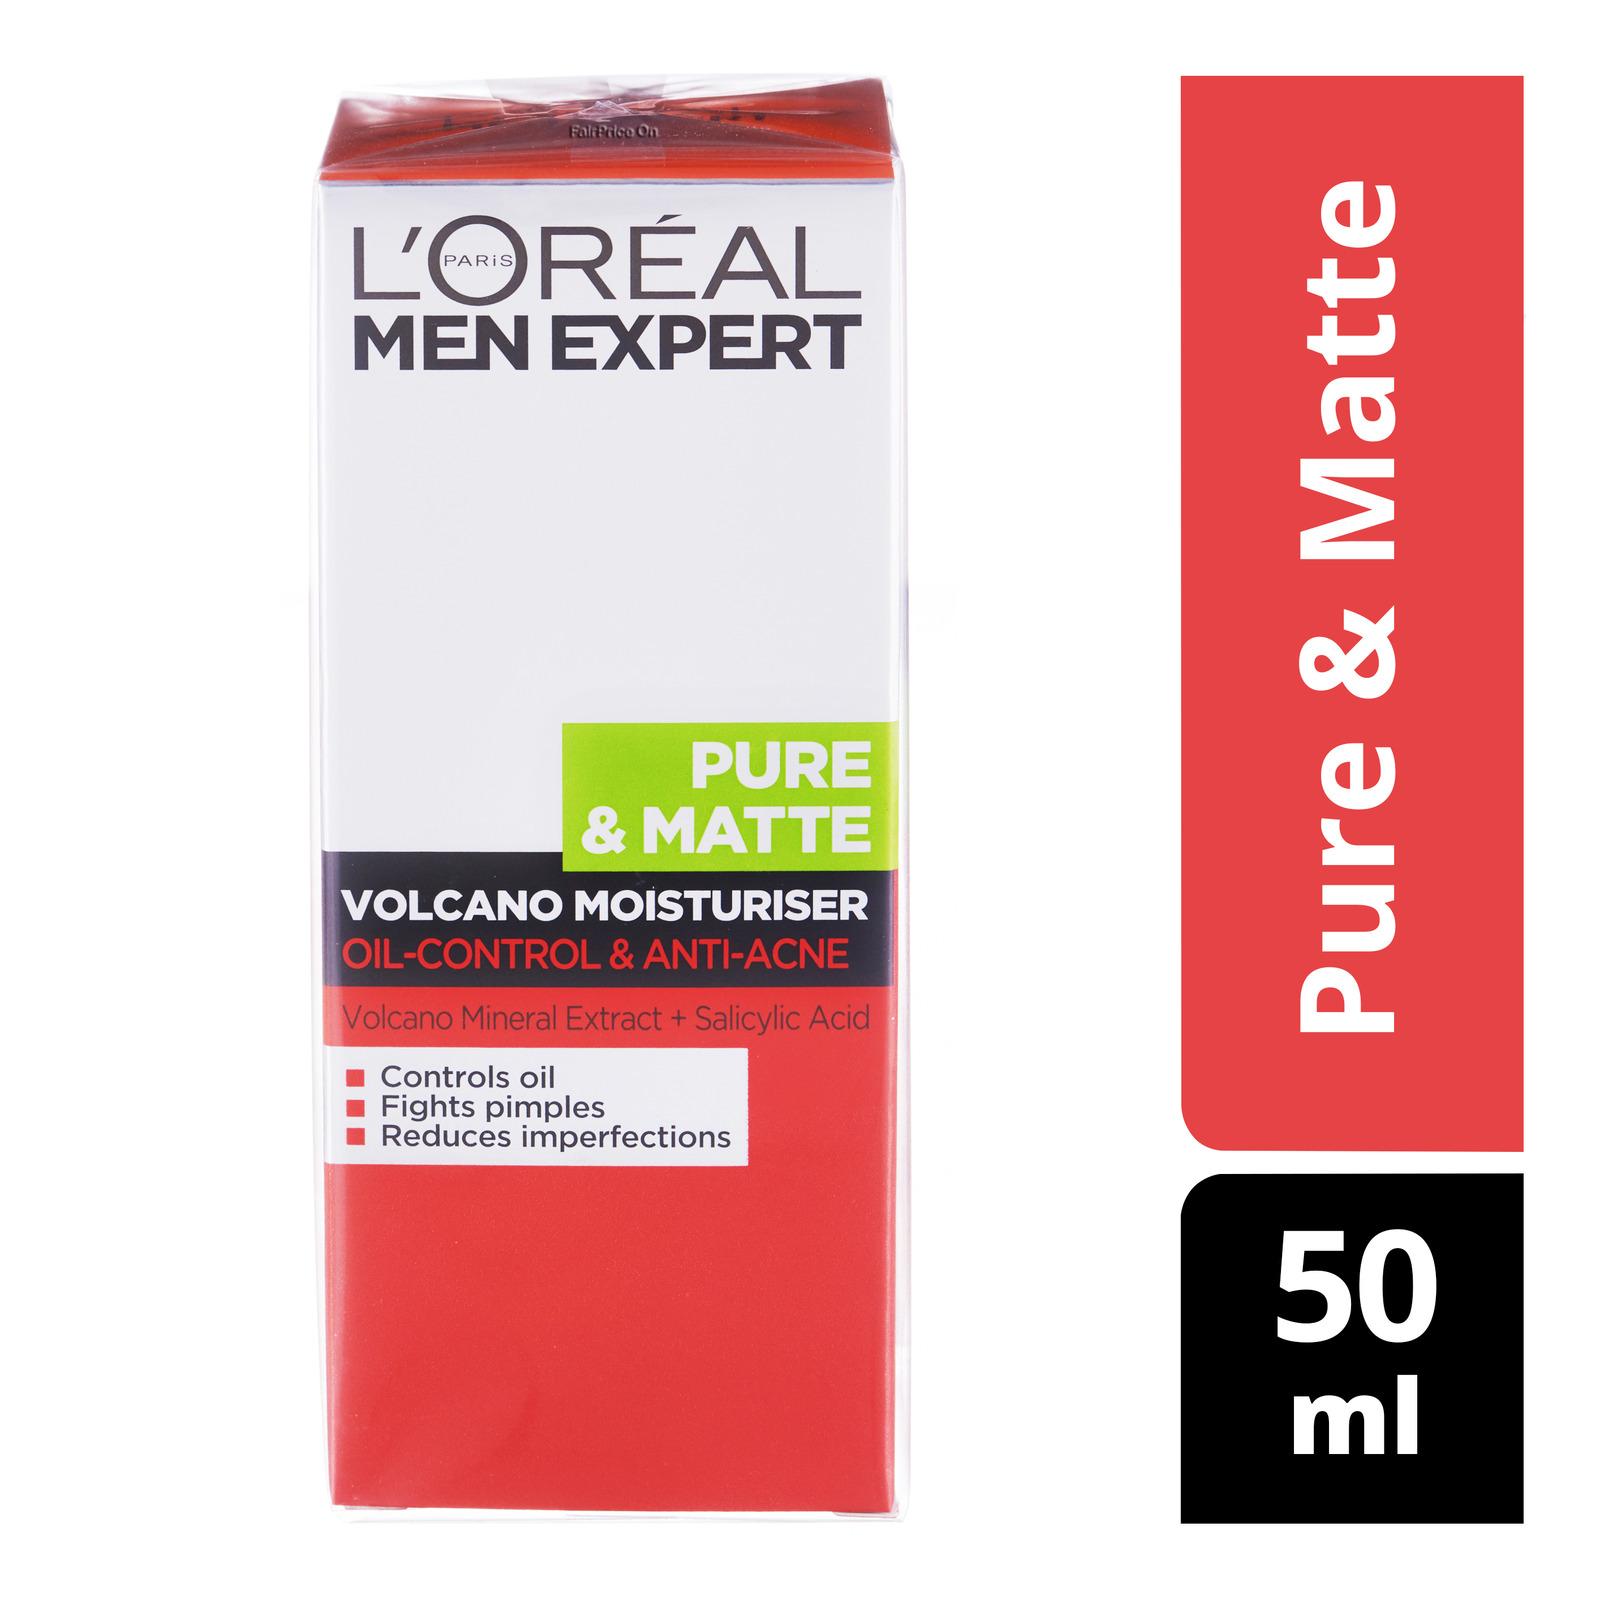 L'Oreal Men Expert Pure Matte Volcano Moisturizer, 50ml